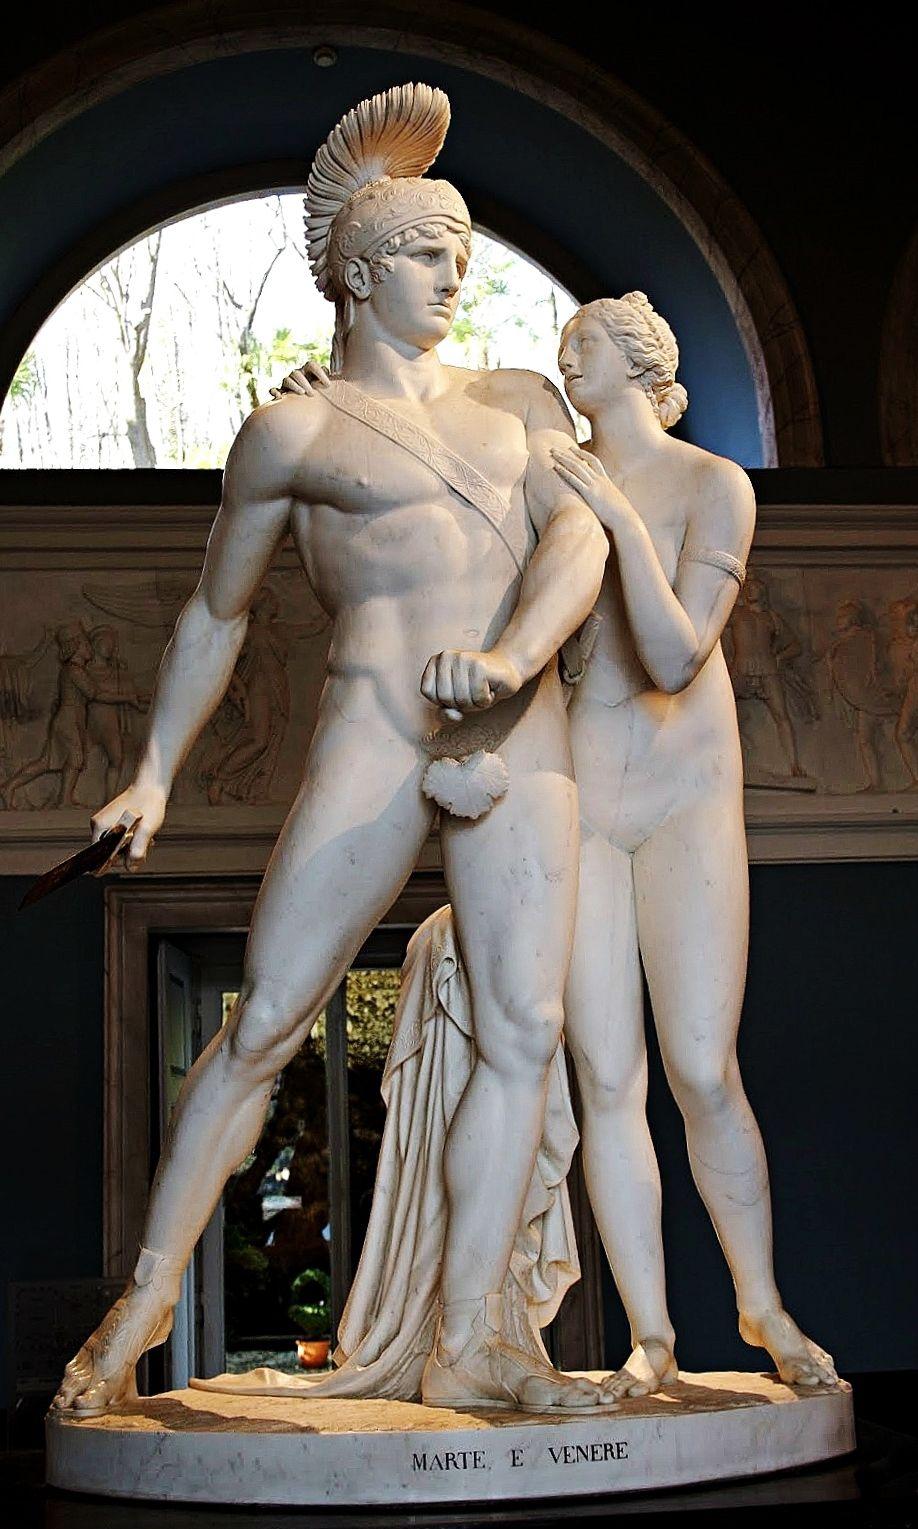 Mars and Venus. 19th.century. Luigi Acquisti. Italian 1745-1821. marble. Villa Carlotta. Lake Como. http://hadrian6.tumblr.com